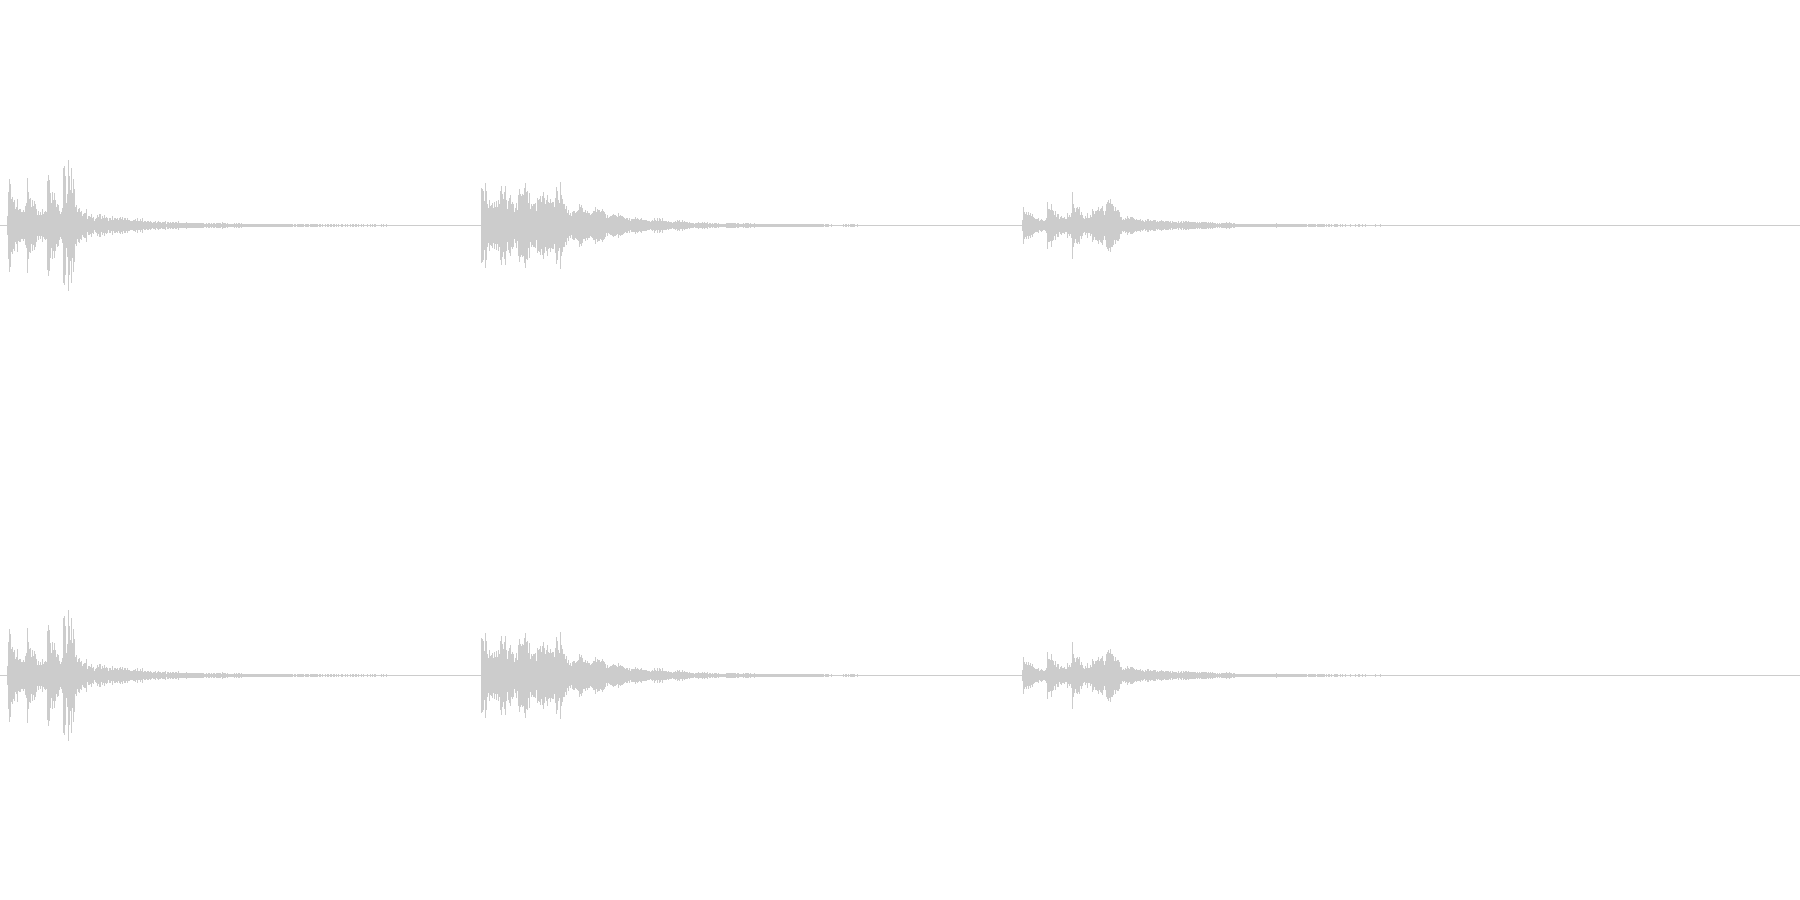 生演奏 琵琶 和風 武士 古典風#22の未再生の波形